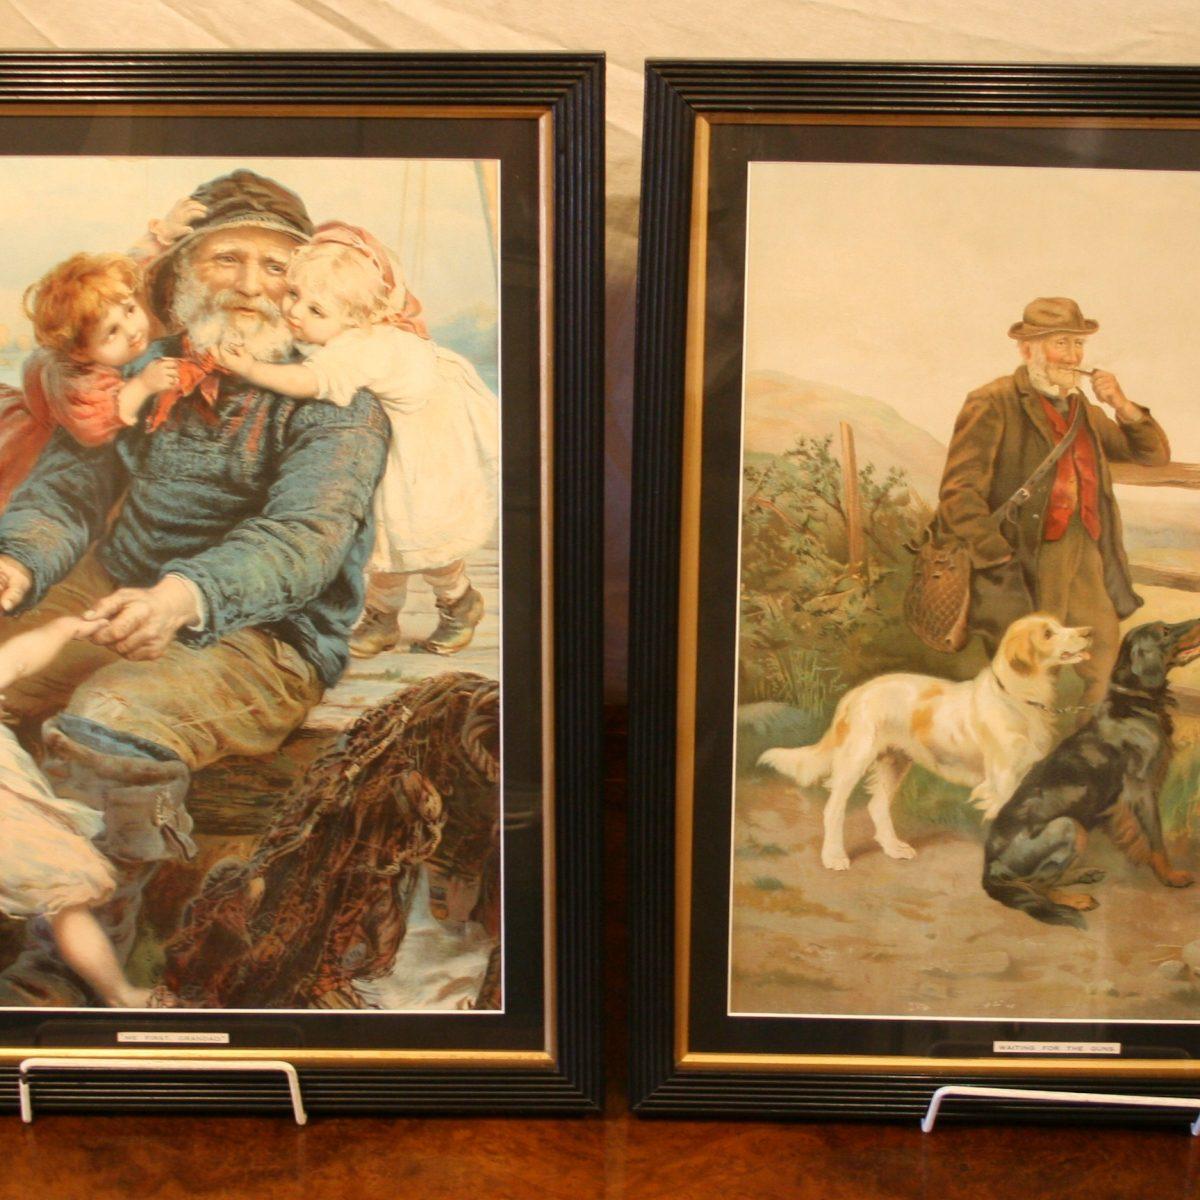 Victorian prints of a fisherman/williamsantiques